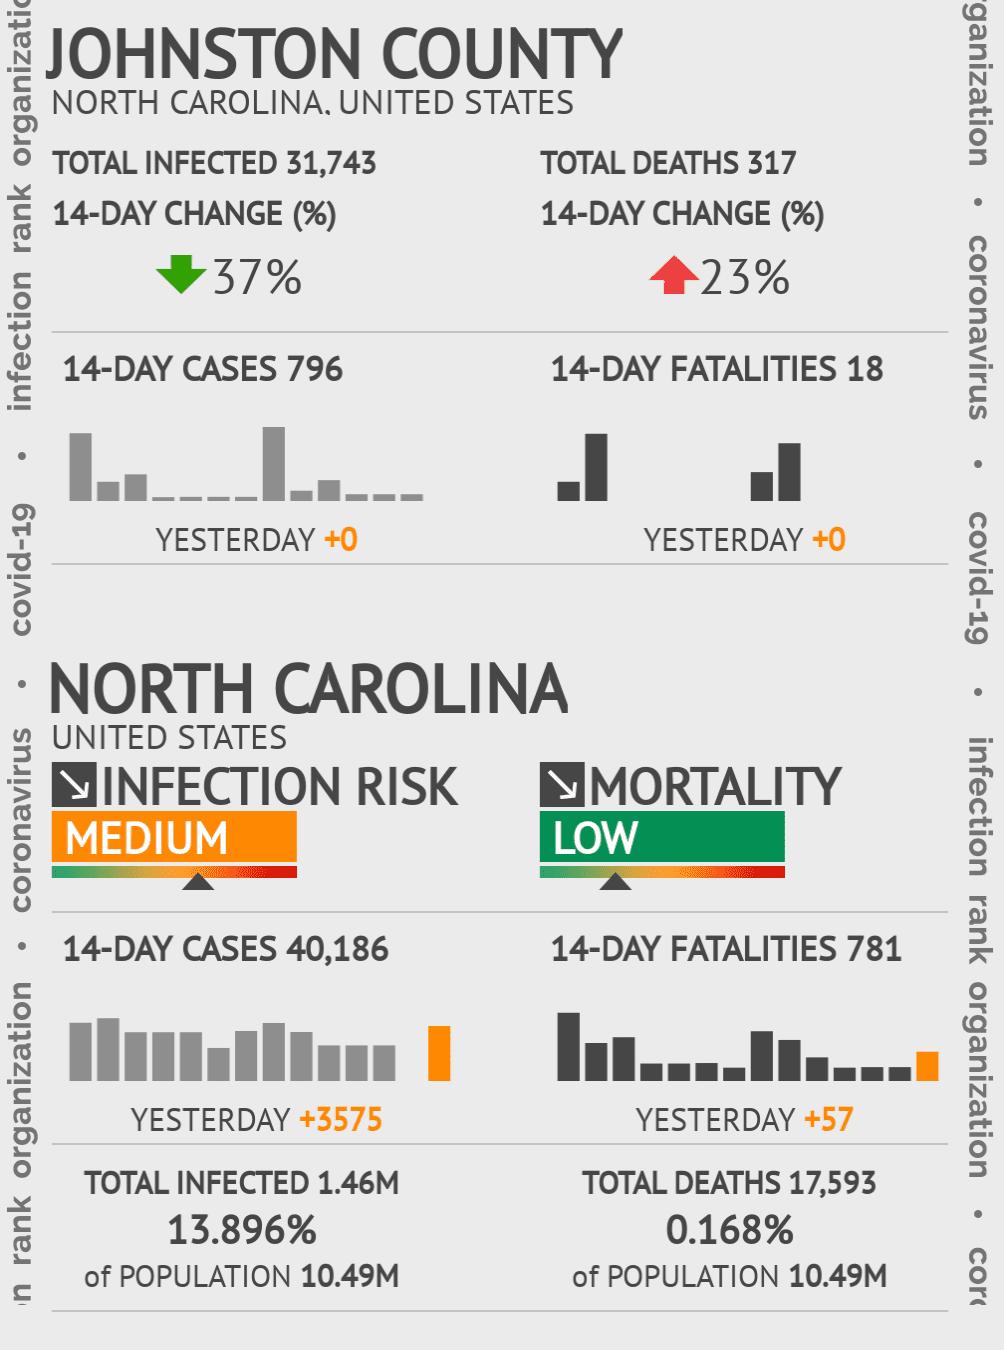 Johnston County Coronavirus Covid-19 Risk of Infection on November 27, 2020